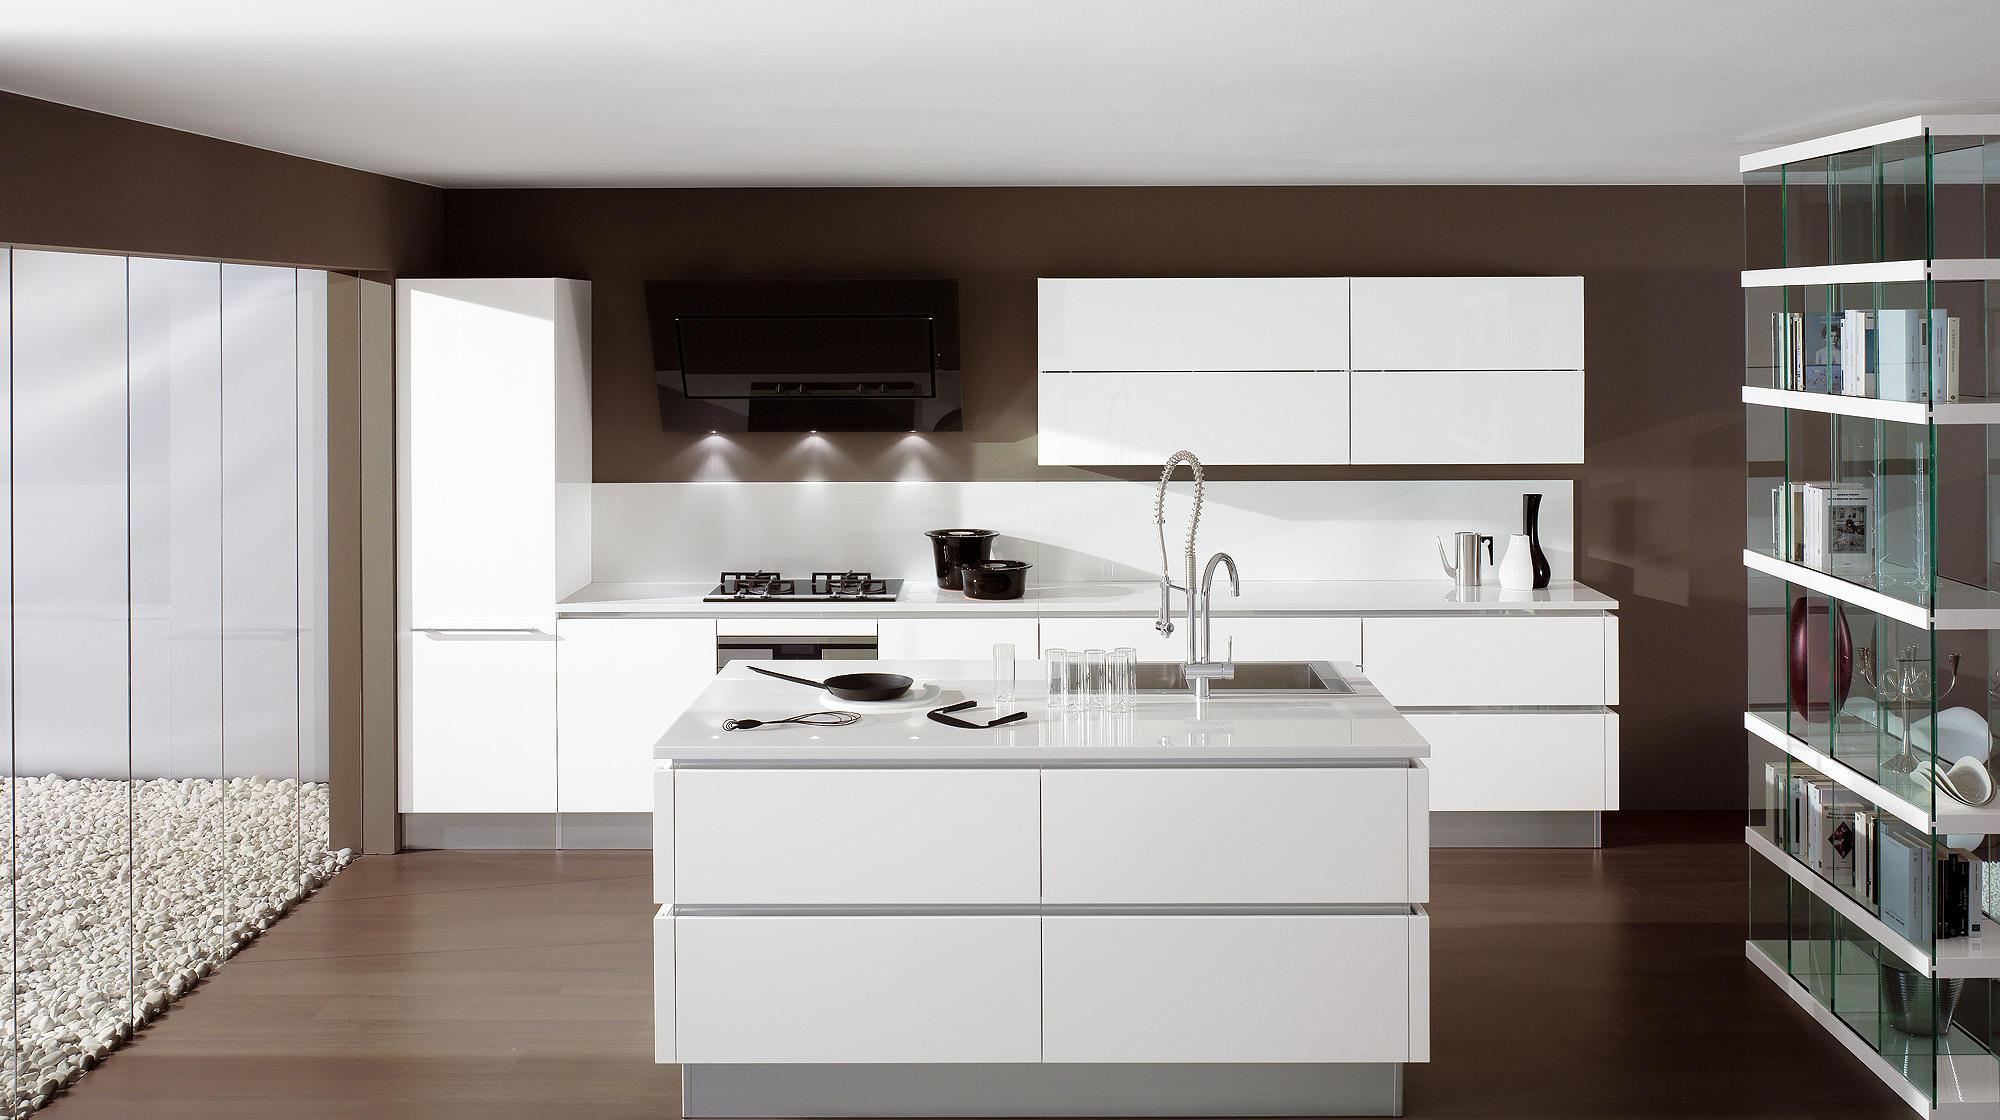 OYSTER  Island kitchens from Veneta Cucine  Architonic